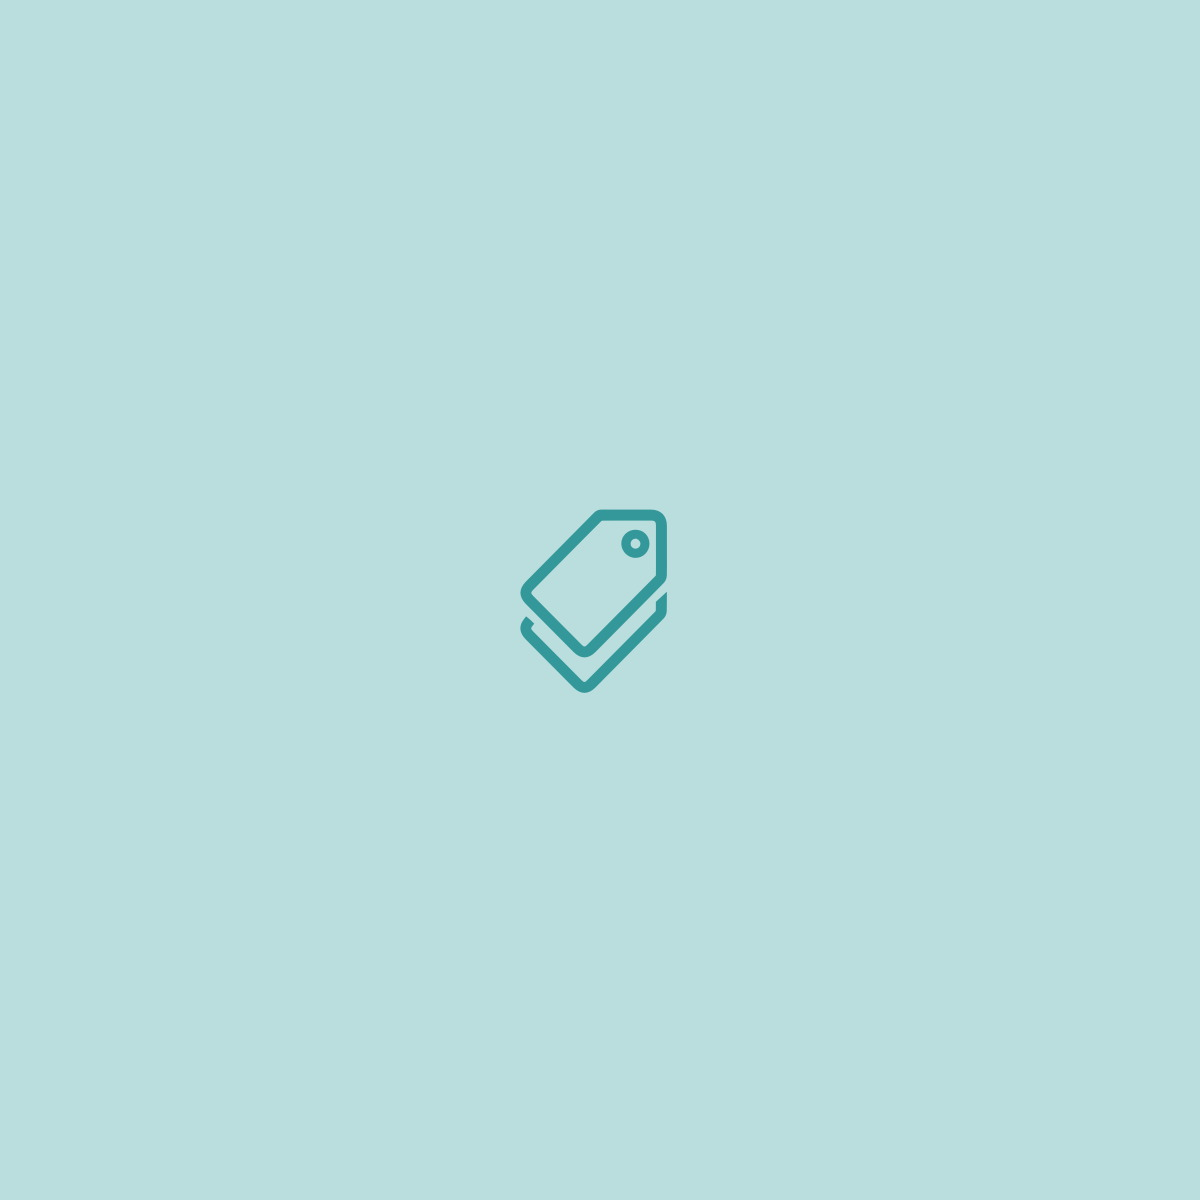 Quadro Decorativo Para Sala Abstrato 100×100 Cod 1010 No Elo7  -> Quadro De Parede Para Sala Abstrato